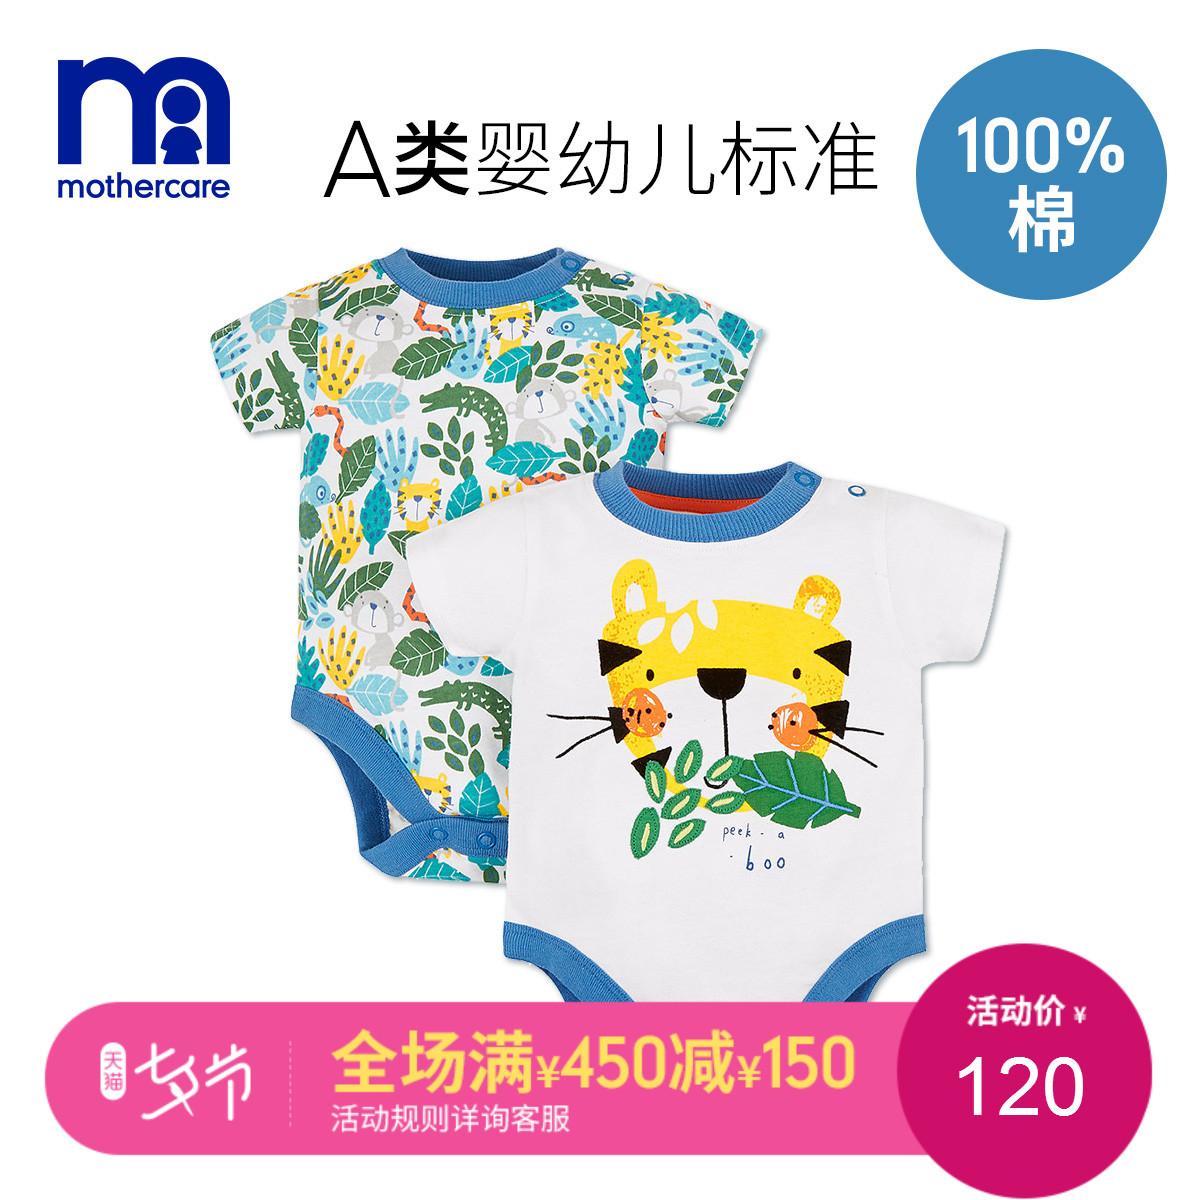 mothercare新生儿宝宝短袖连体衣2件装2018夏季男婴儿服宝宝衣服